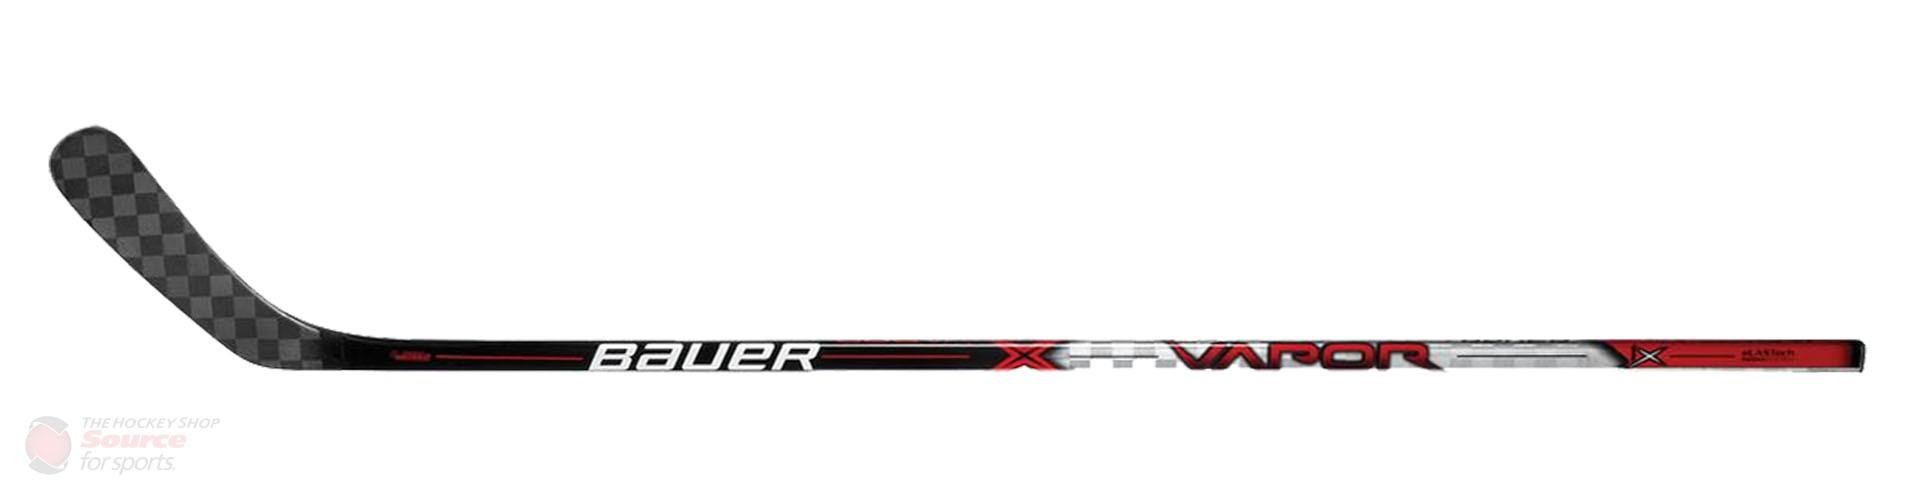 The Bauer Vapor 1X LE